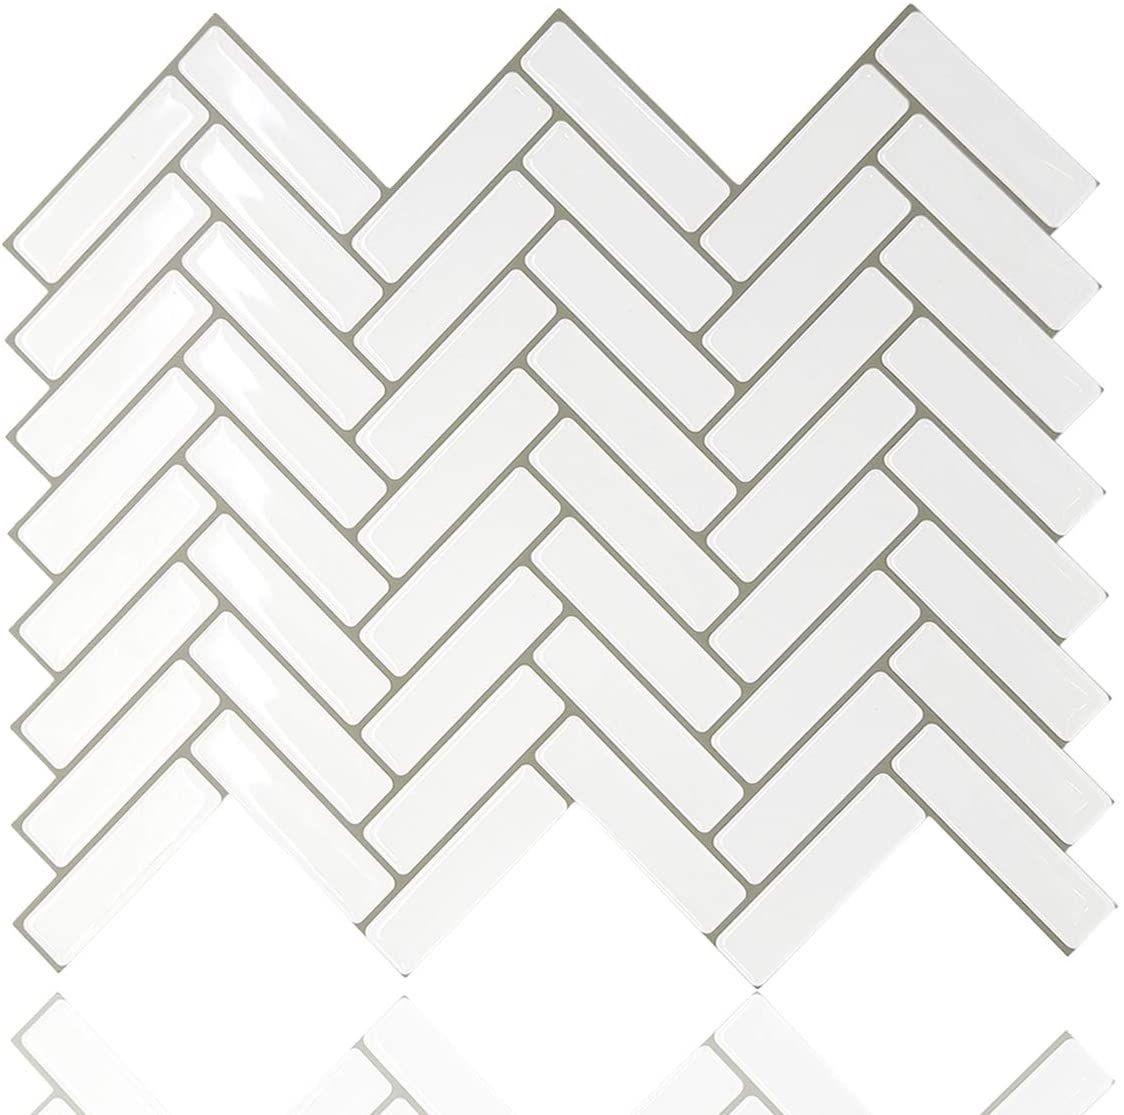 Stickgoo Peel And Stick Tile Backsplash White Herringbone Adhesive Backsplash Tiles Stick On Tiles F Stick On Tiles Stick Tile Backsplash Adhesive Backsplash